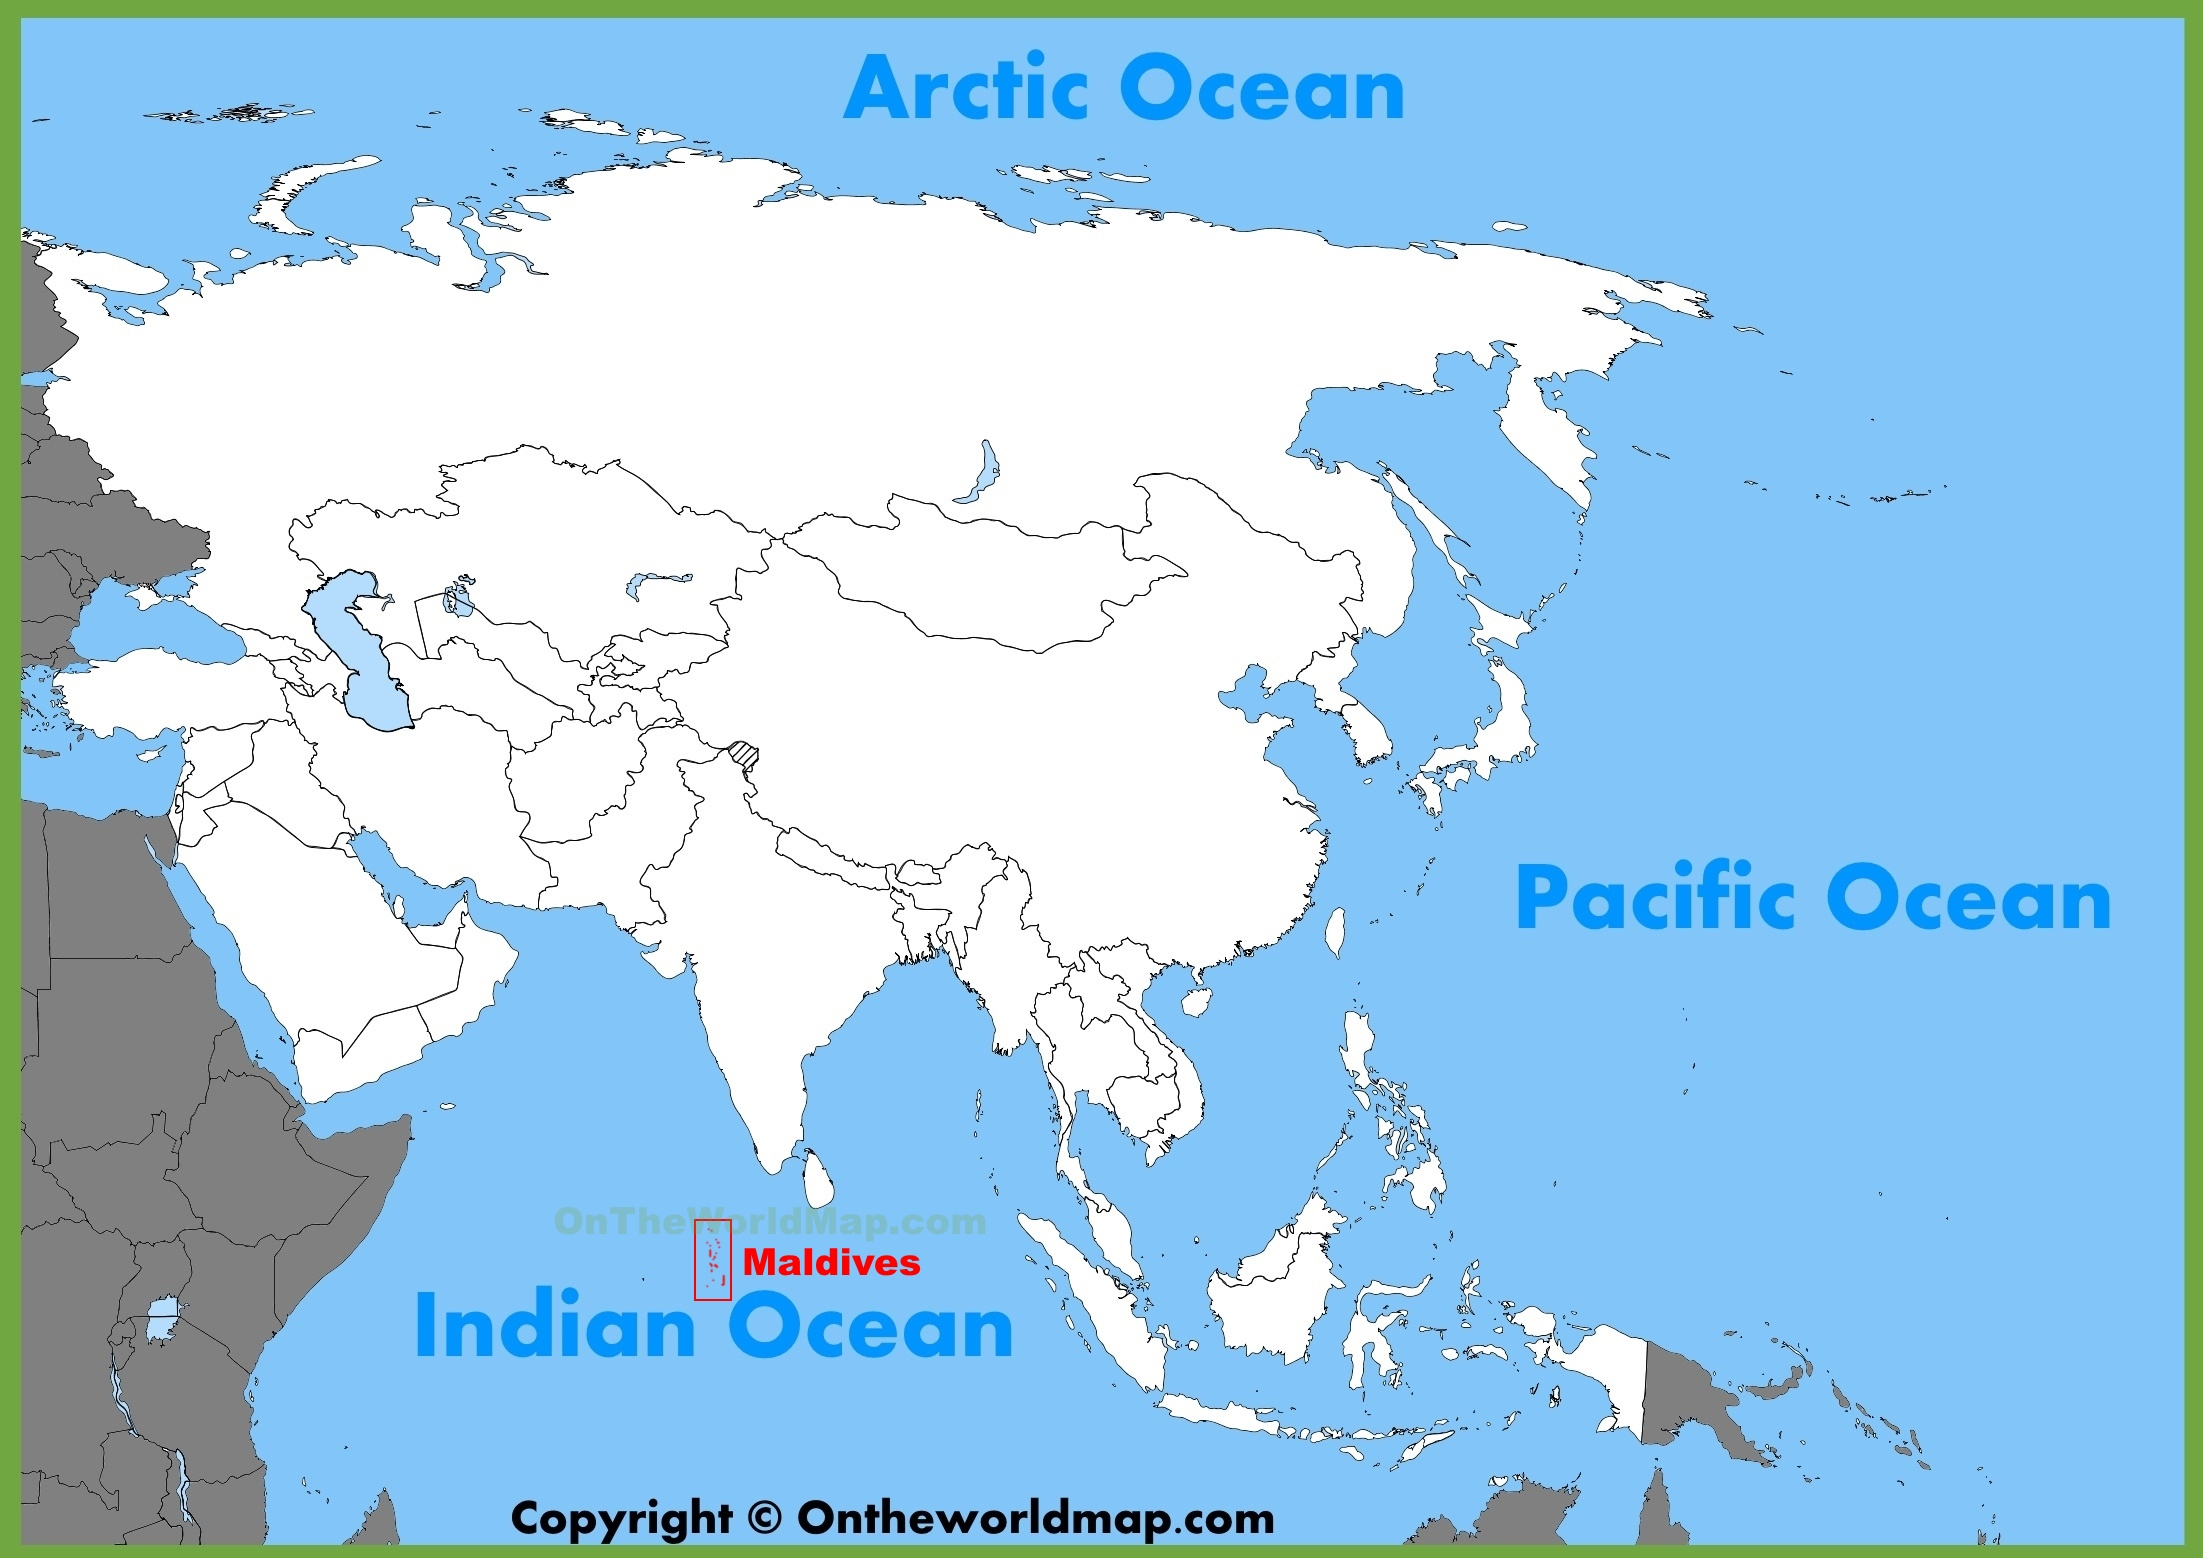 Maldives Location Map Maldives location on the Asia map Maldives Location Map